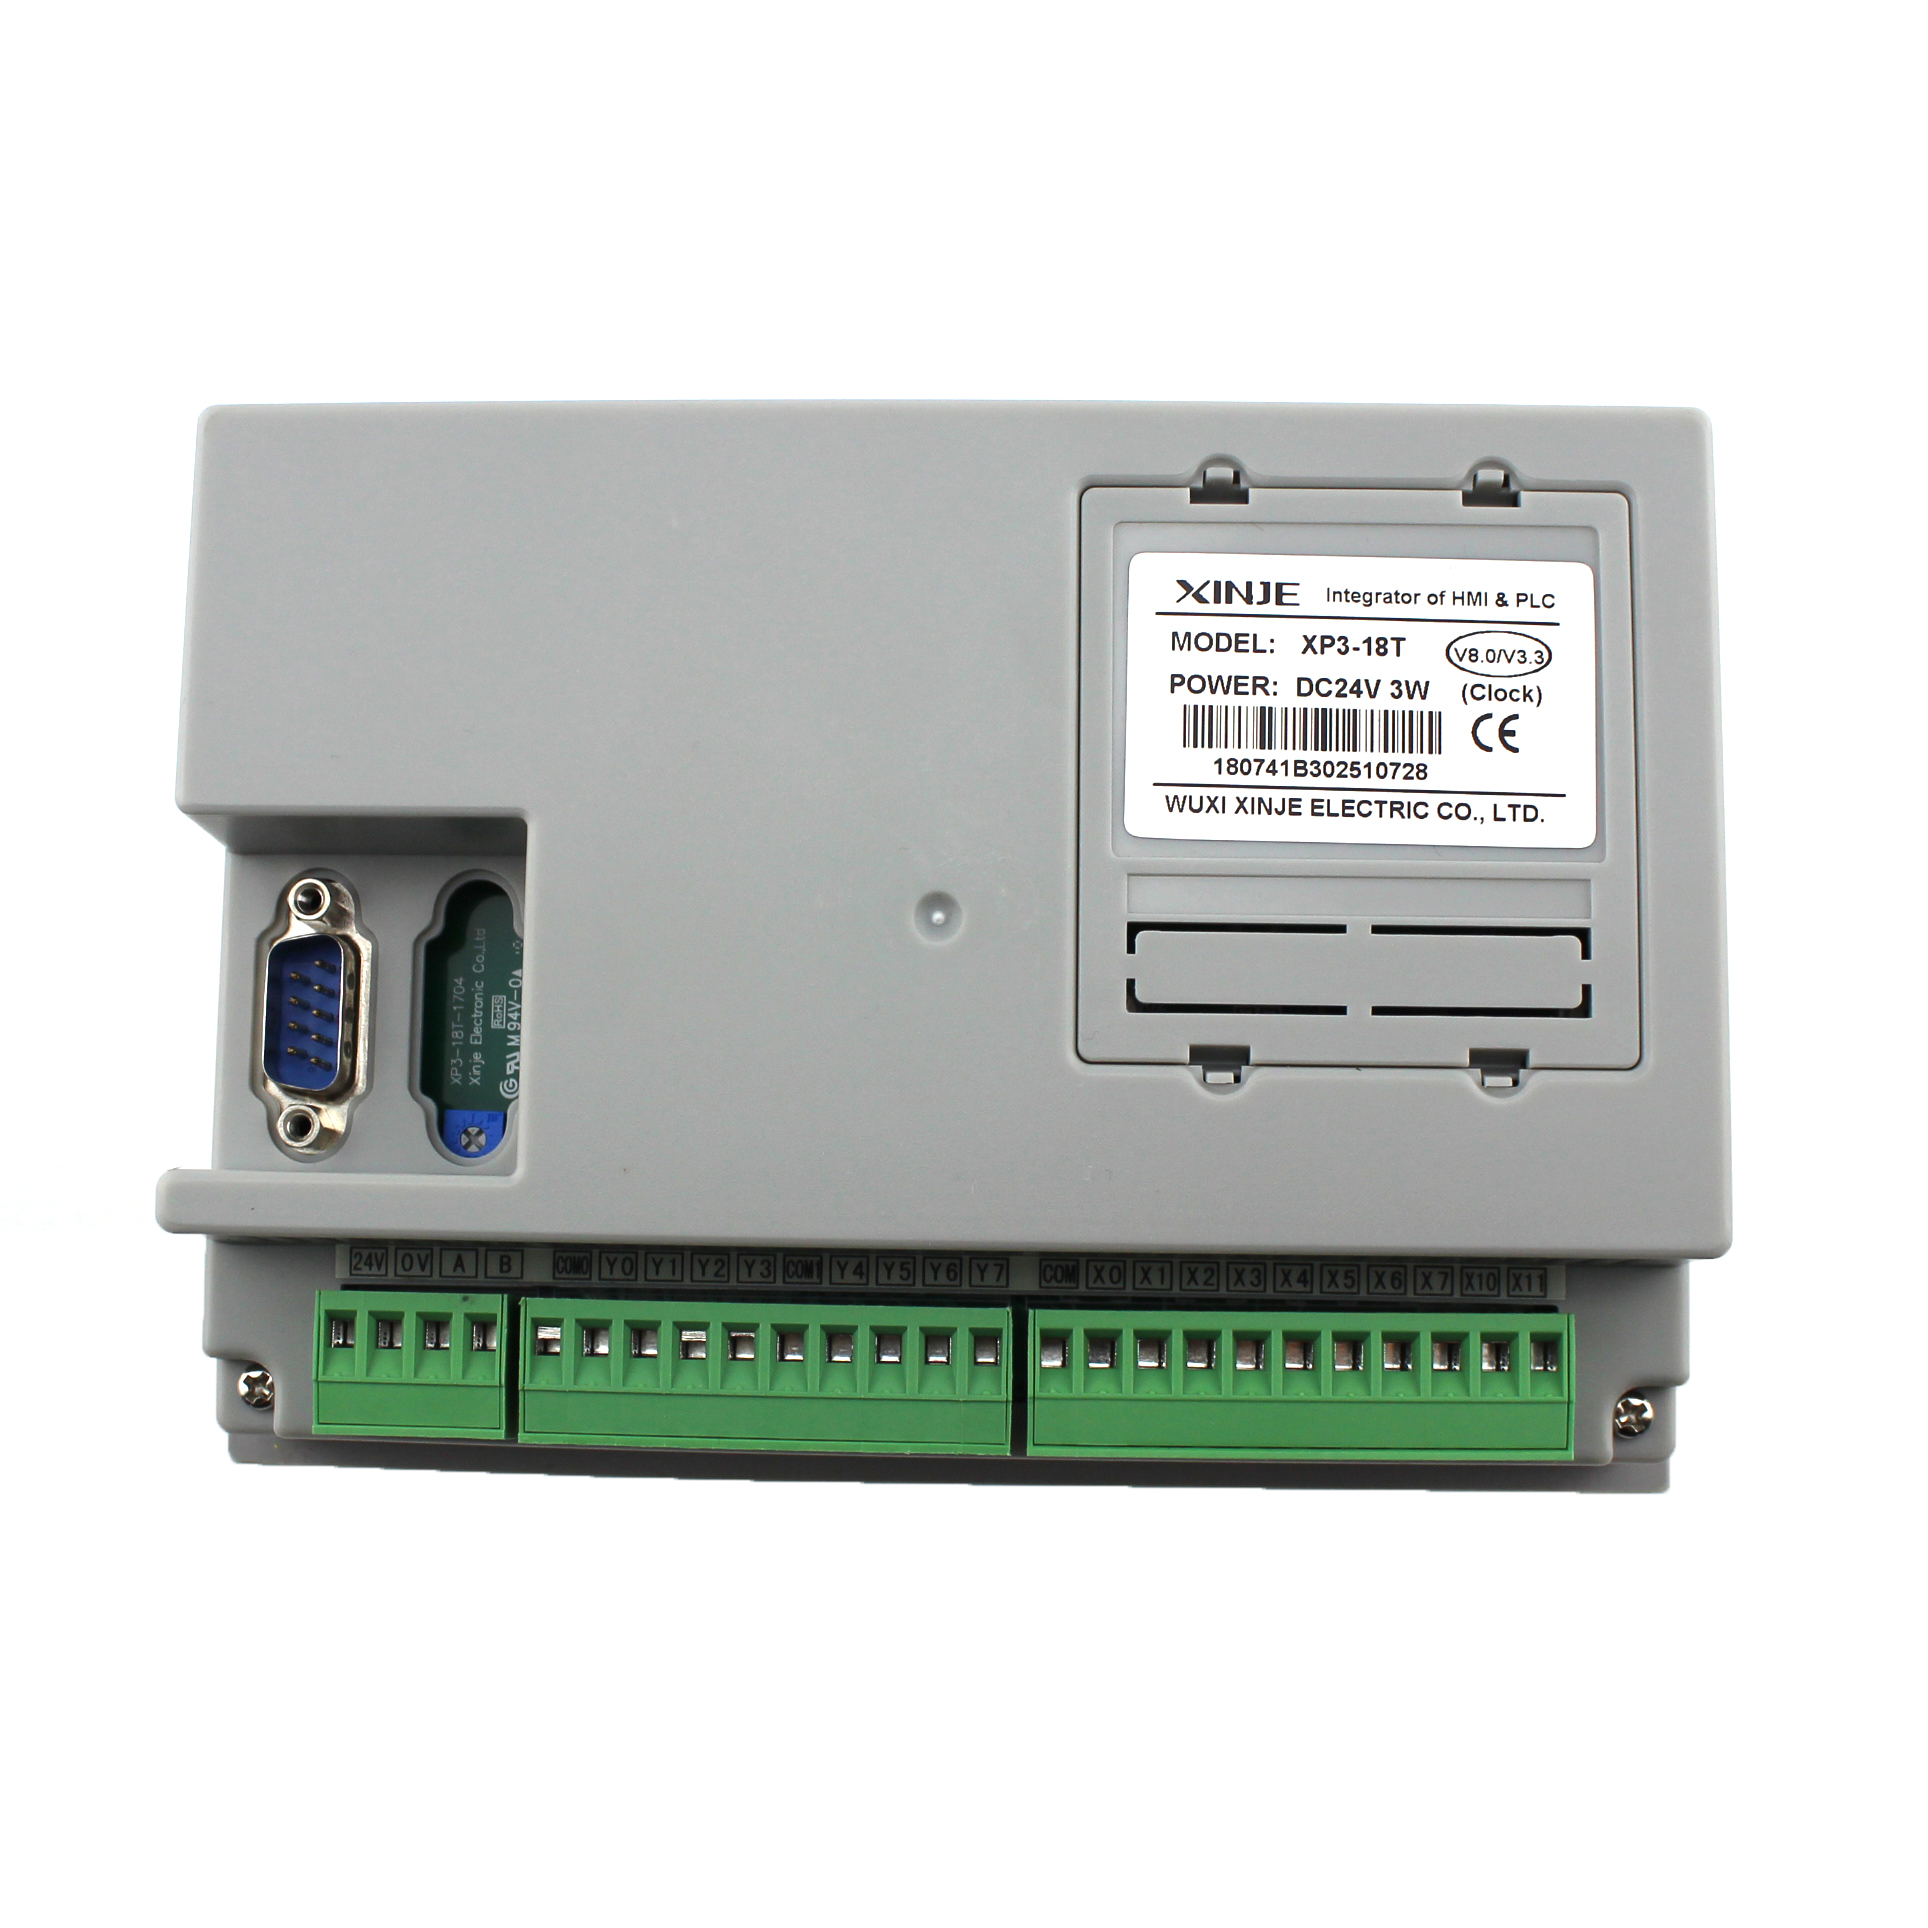 "New For Xinje 3.7/"" LCD Integrator Of HMI /& PLC XP3-18R HMI  DC24V 3W"